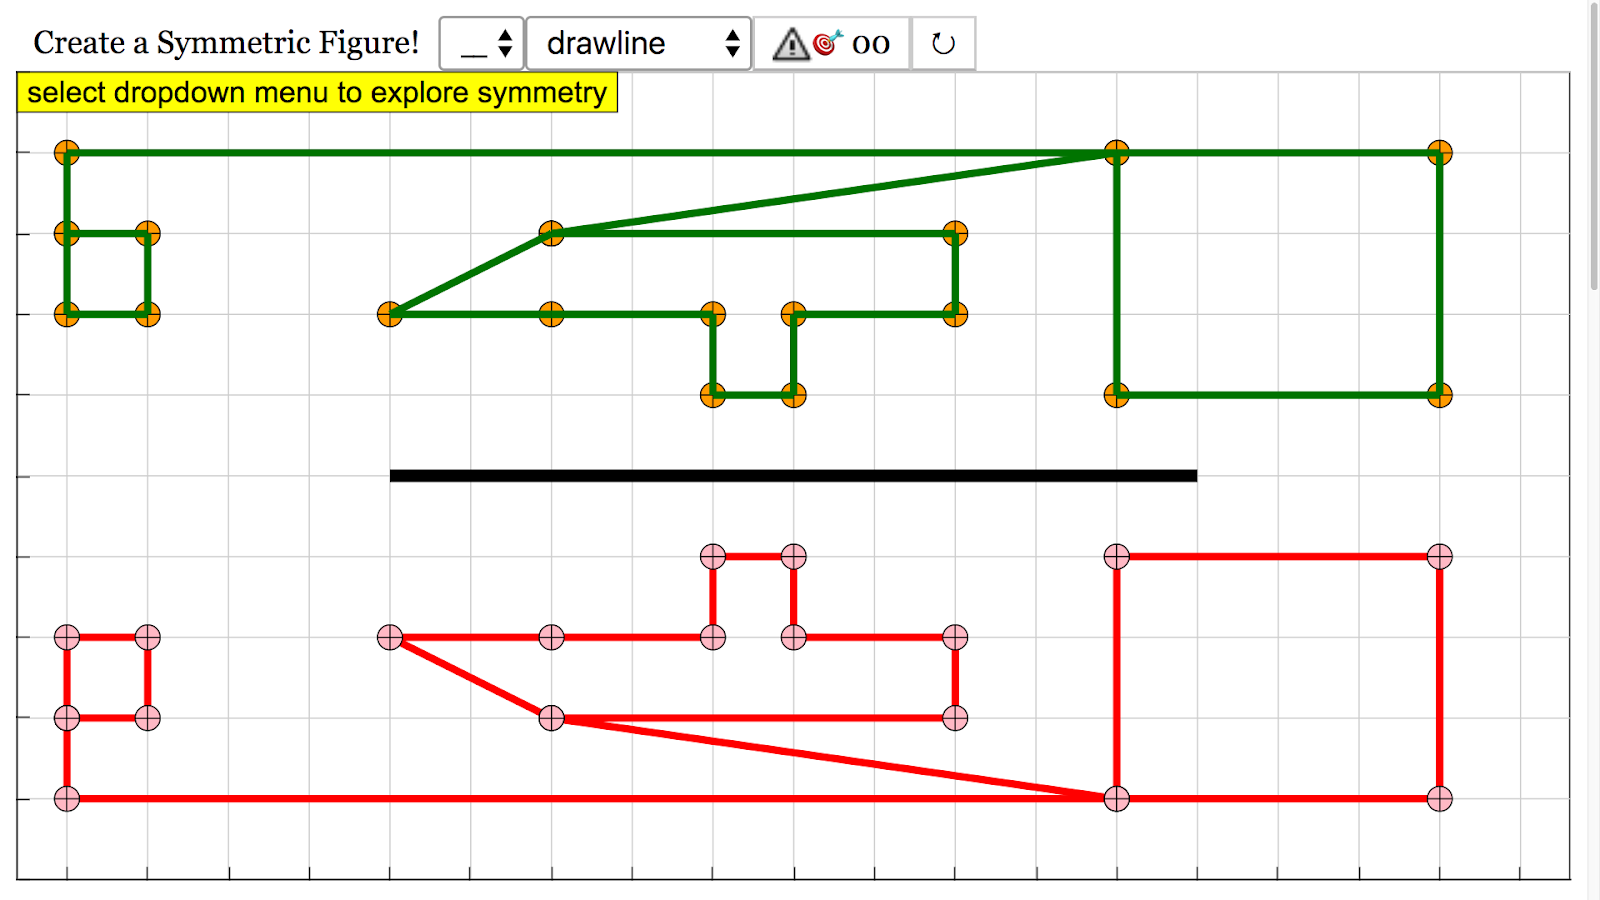 Symmetry Block Javascript Html5 Applet Simulation Model Open Diagram And Drawing